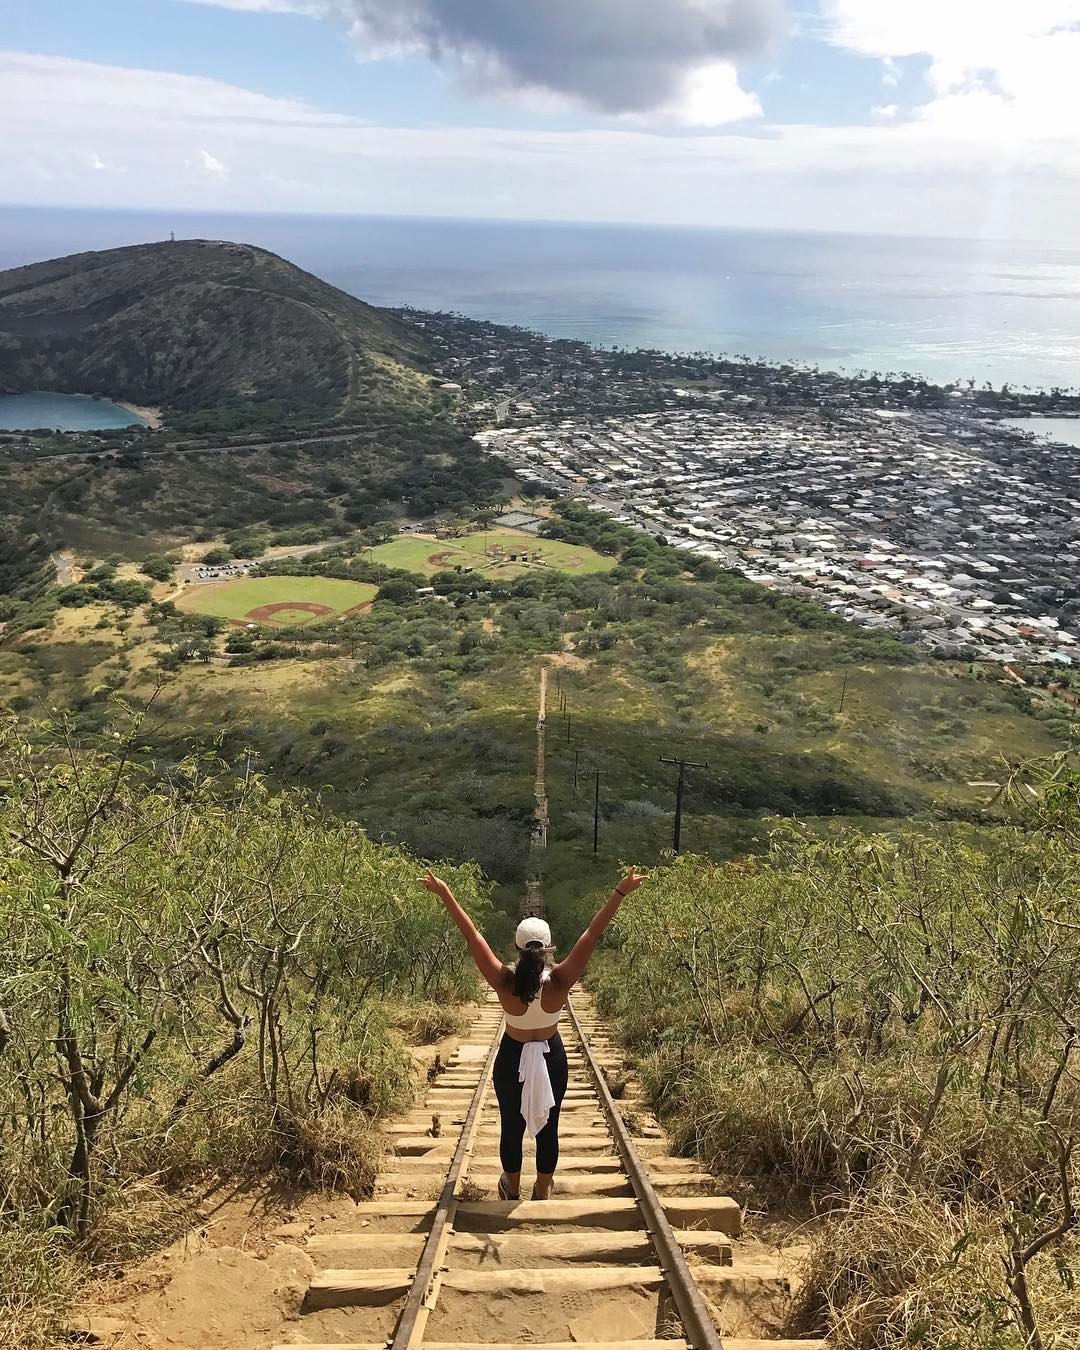 Hike Kokohead Crater - Best Things to Do in East Oahu